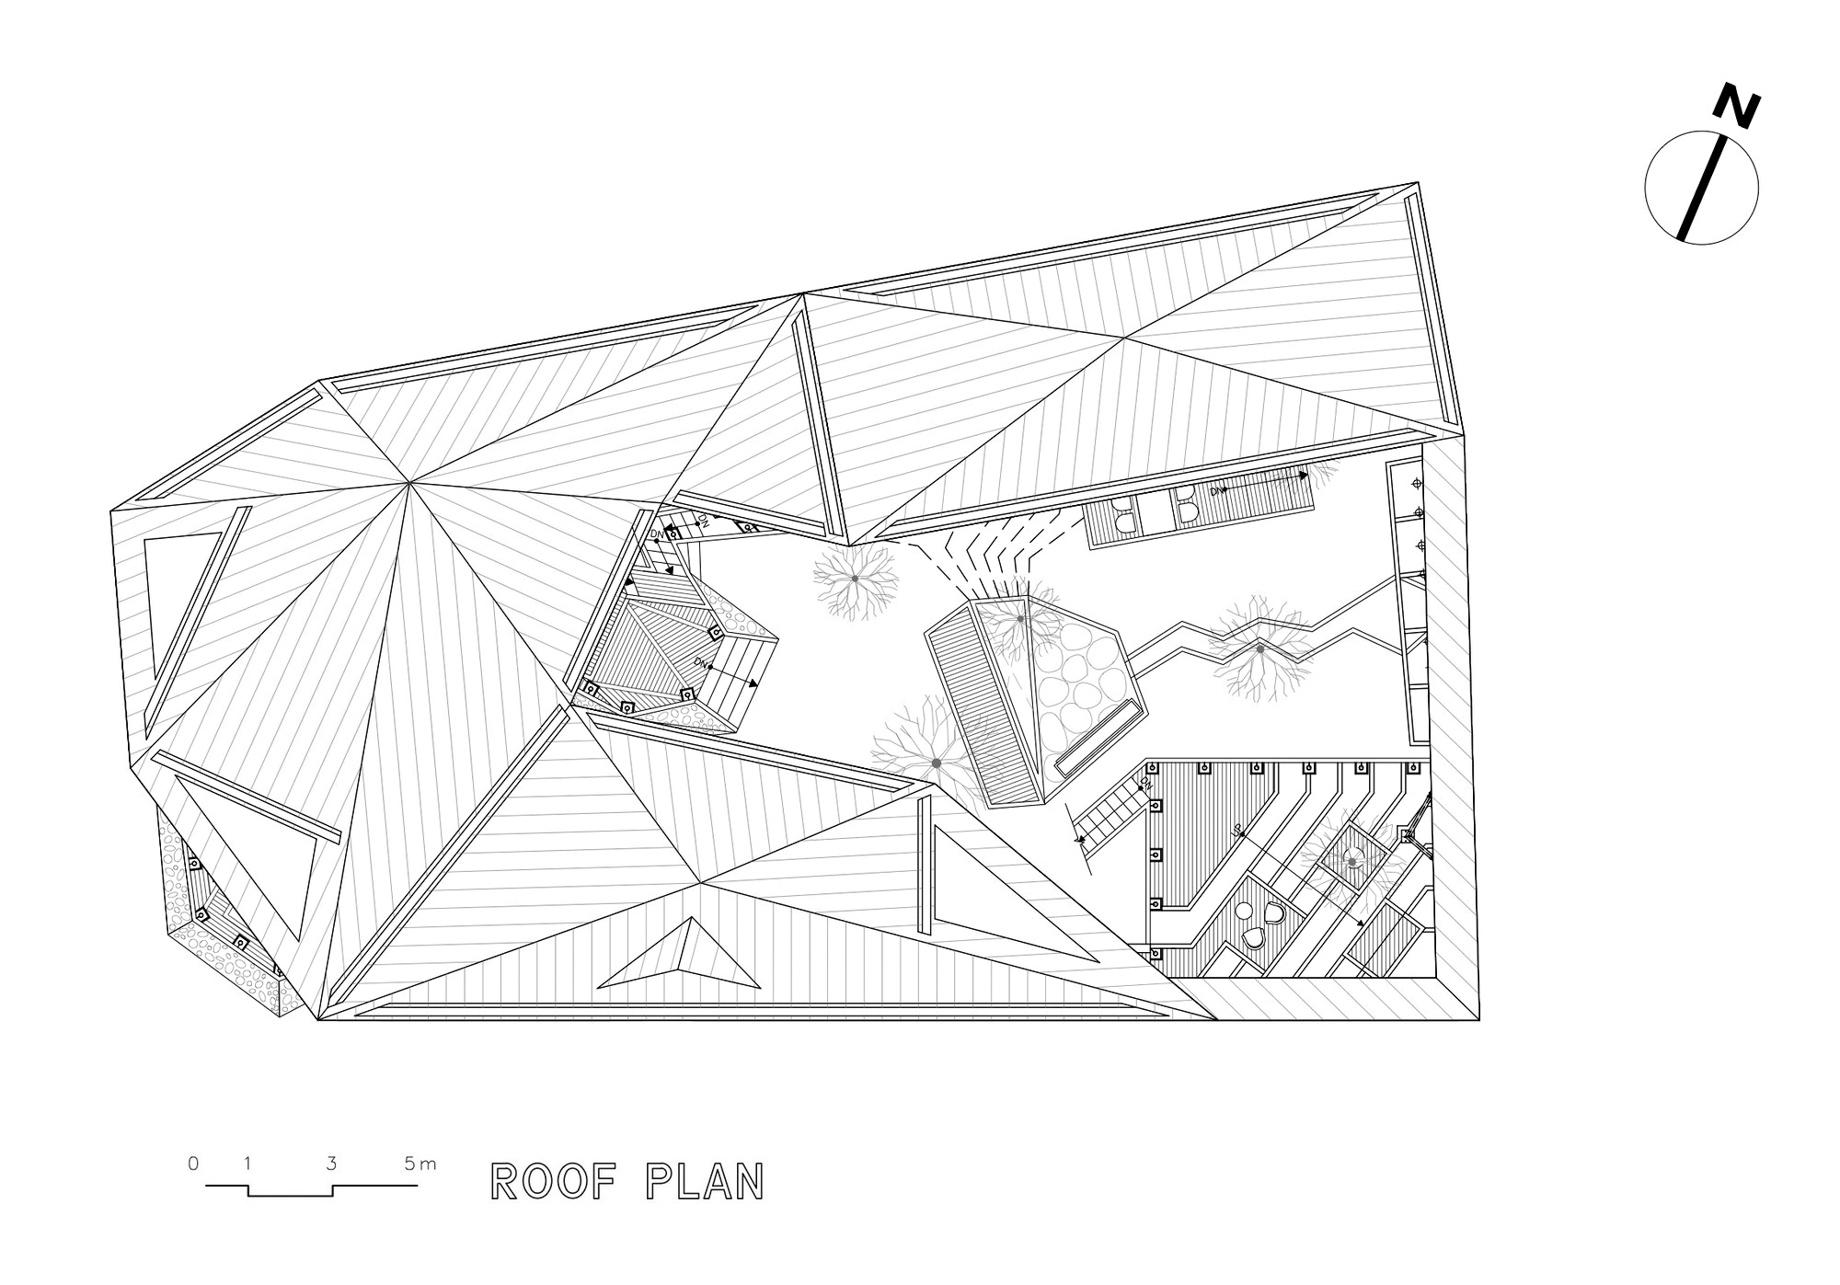 Third Floor Plan - Ga On Jai Residence - Seongnam, Gyeonggi, South Korea